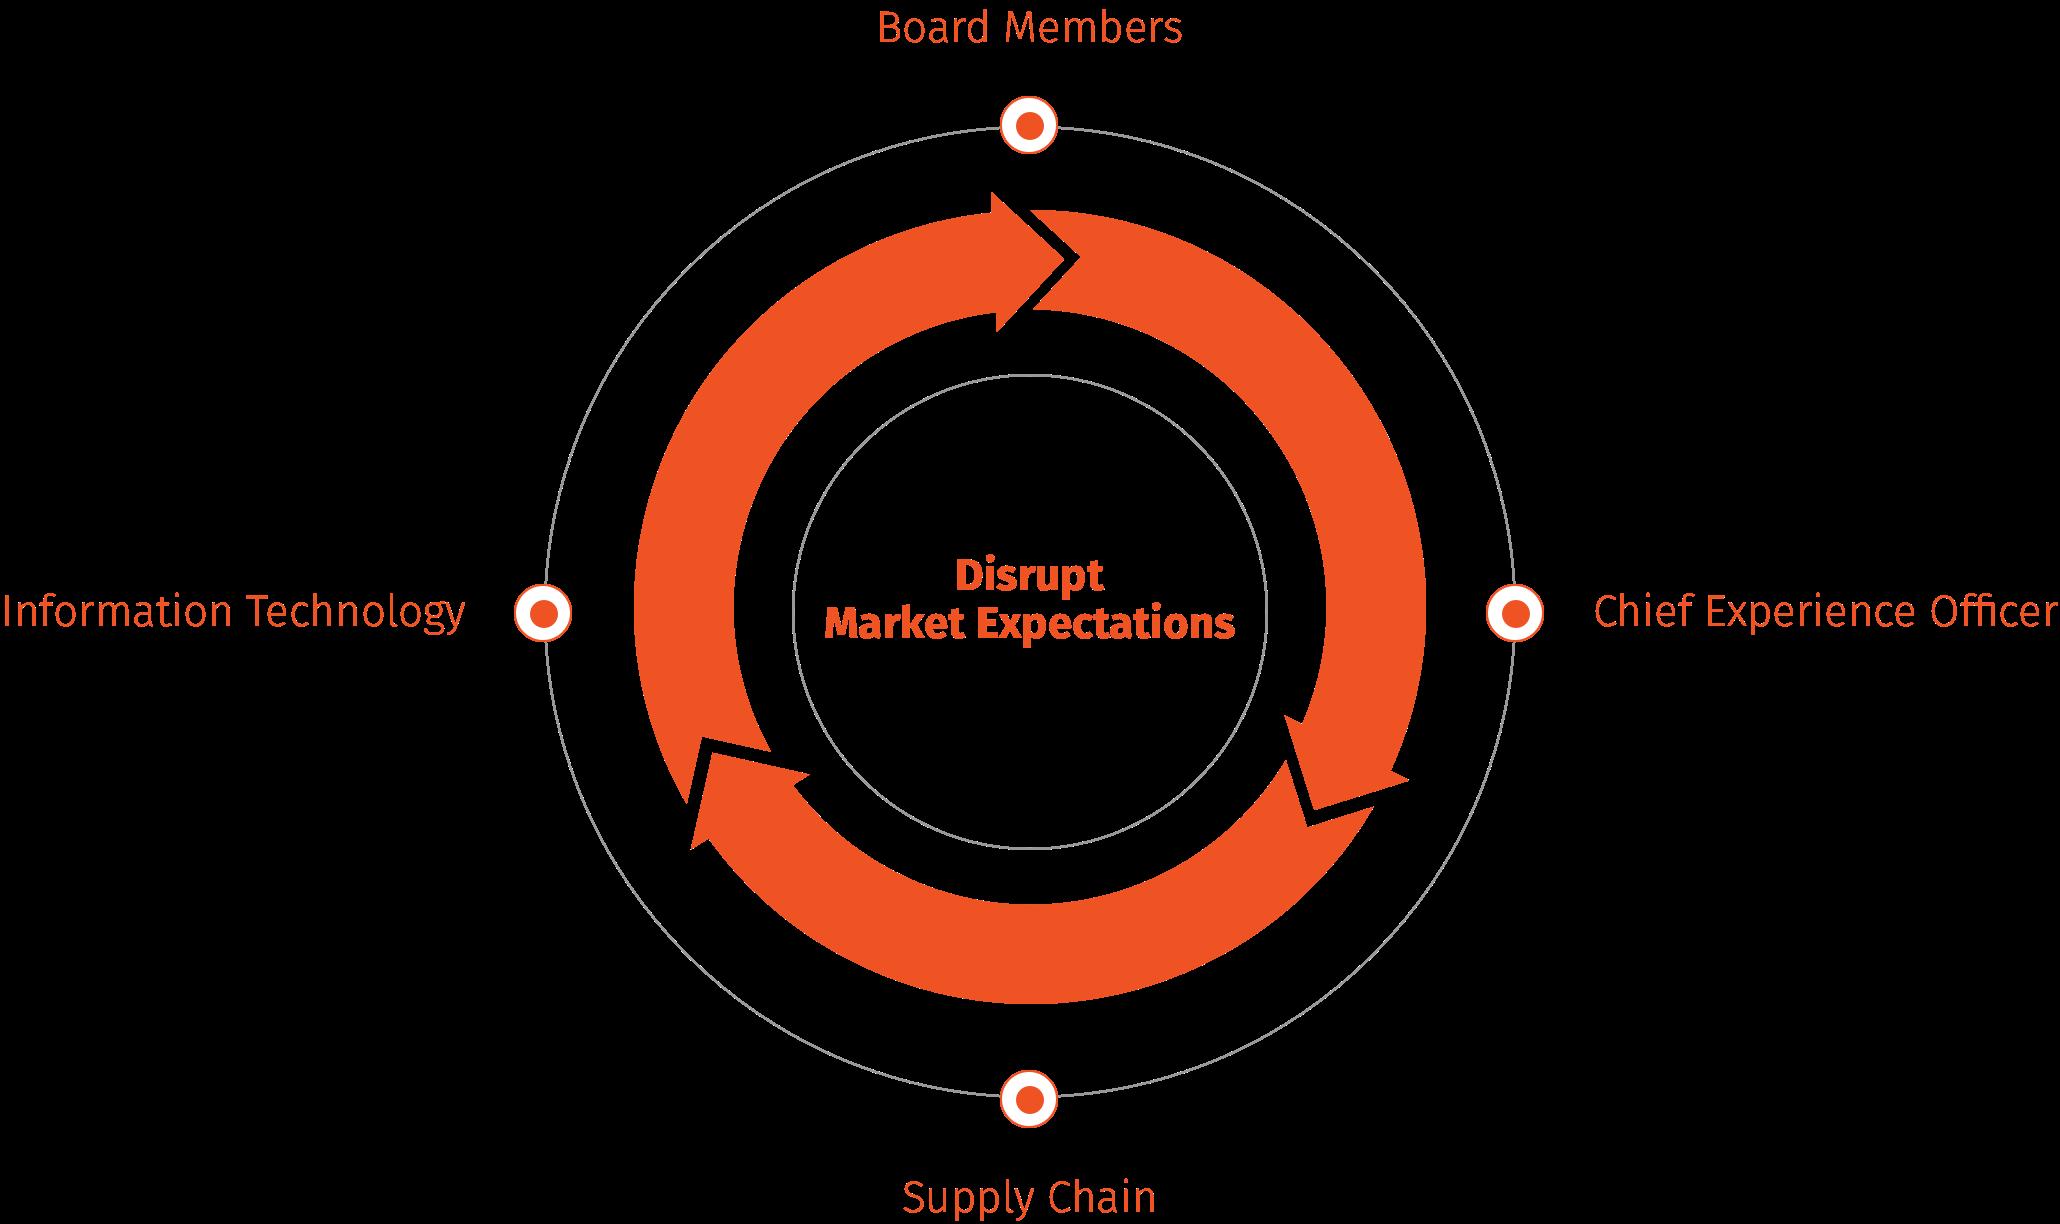 Disrupt market expectations circle